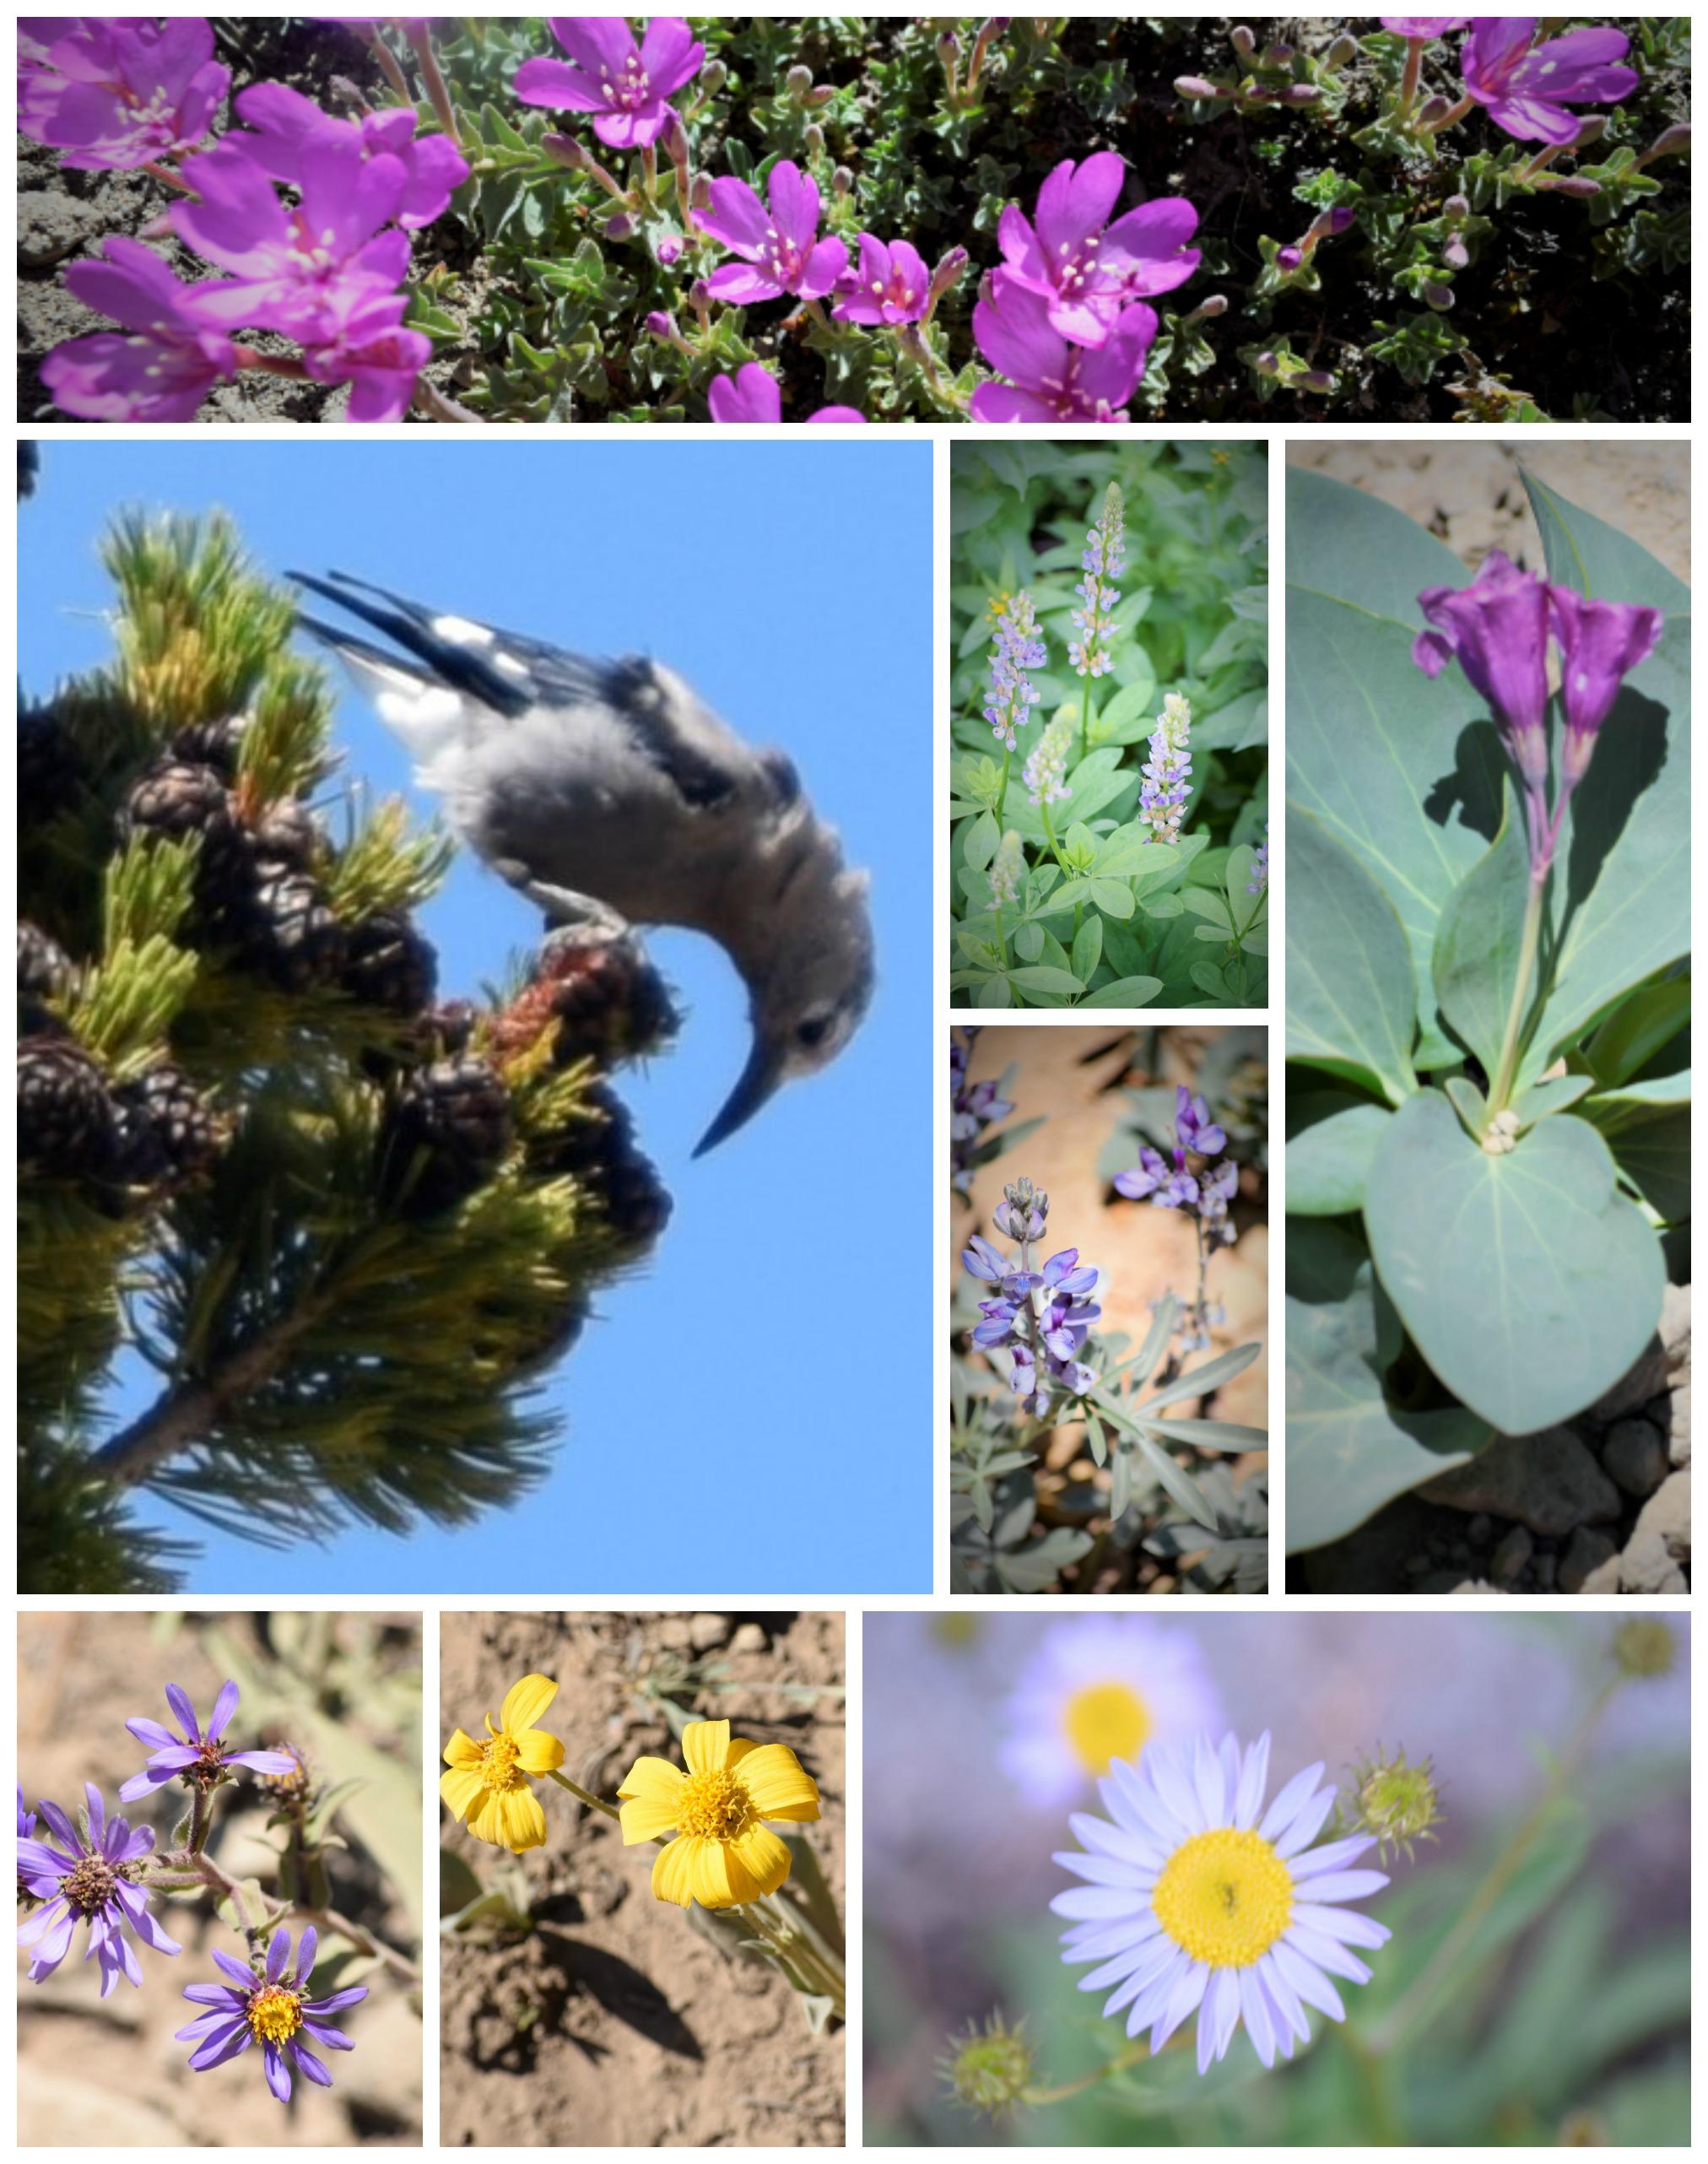 beokeoff mountain flowers